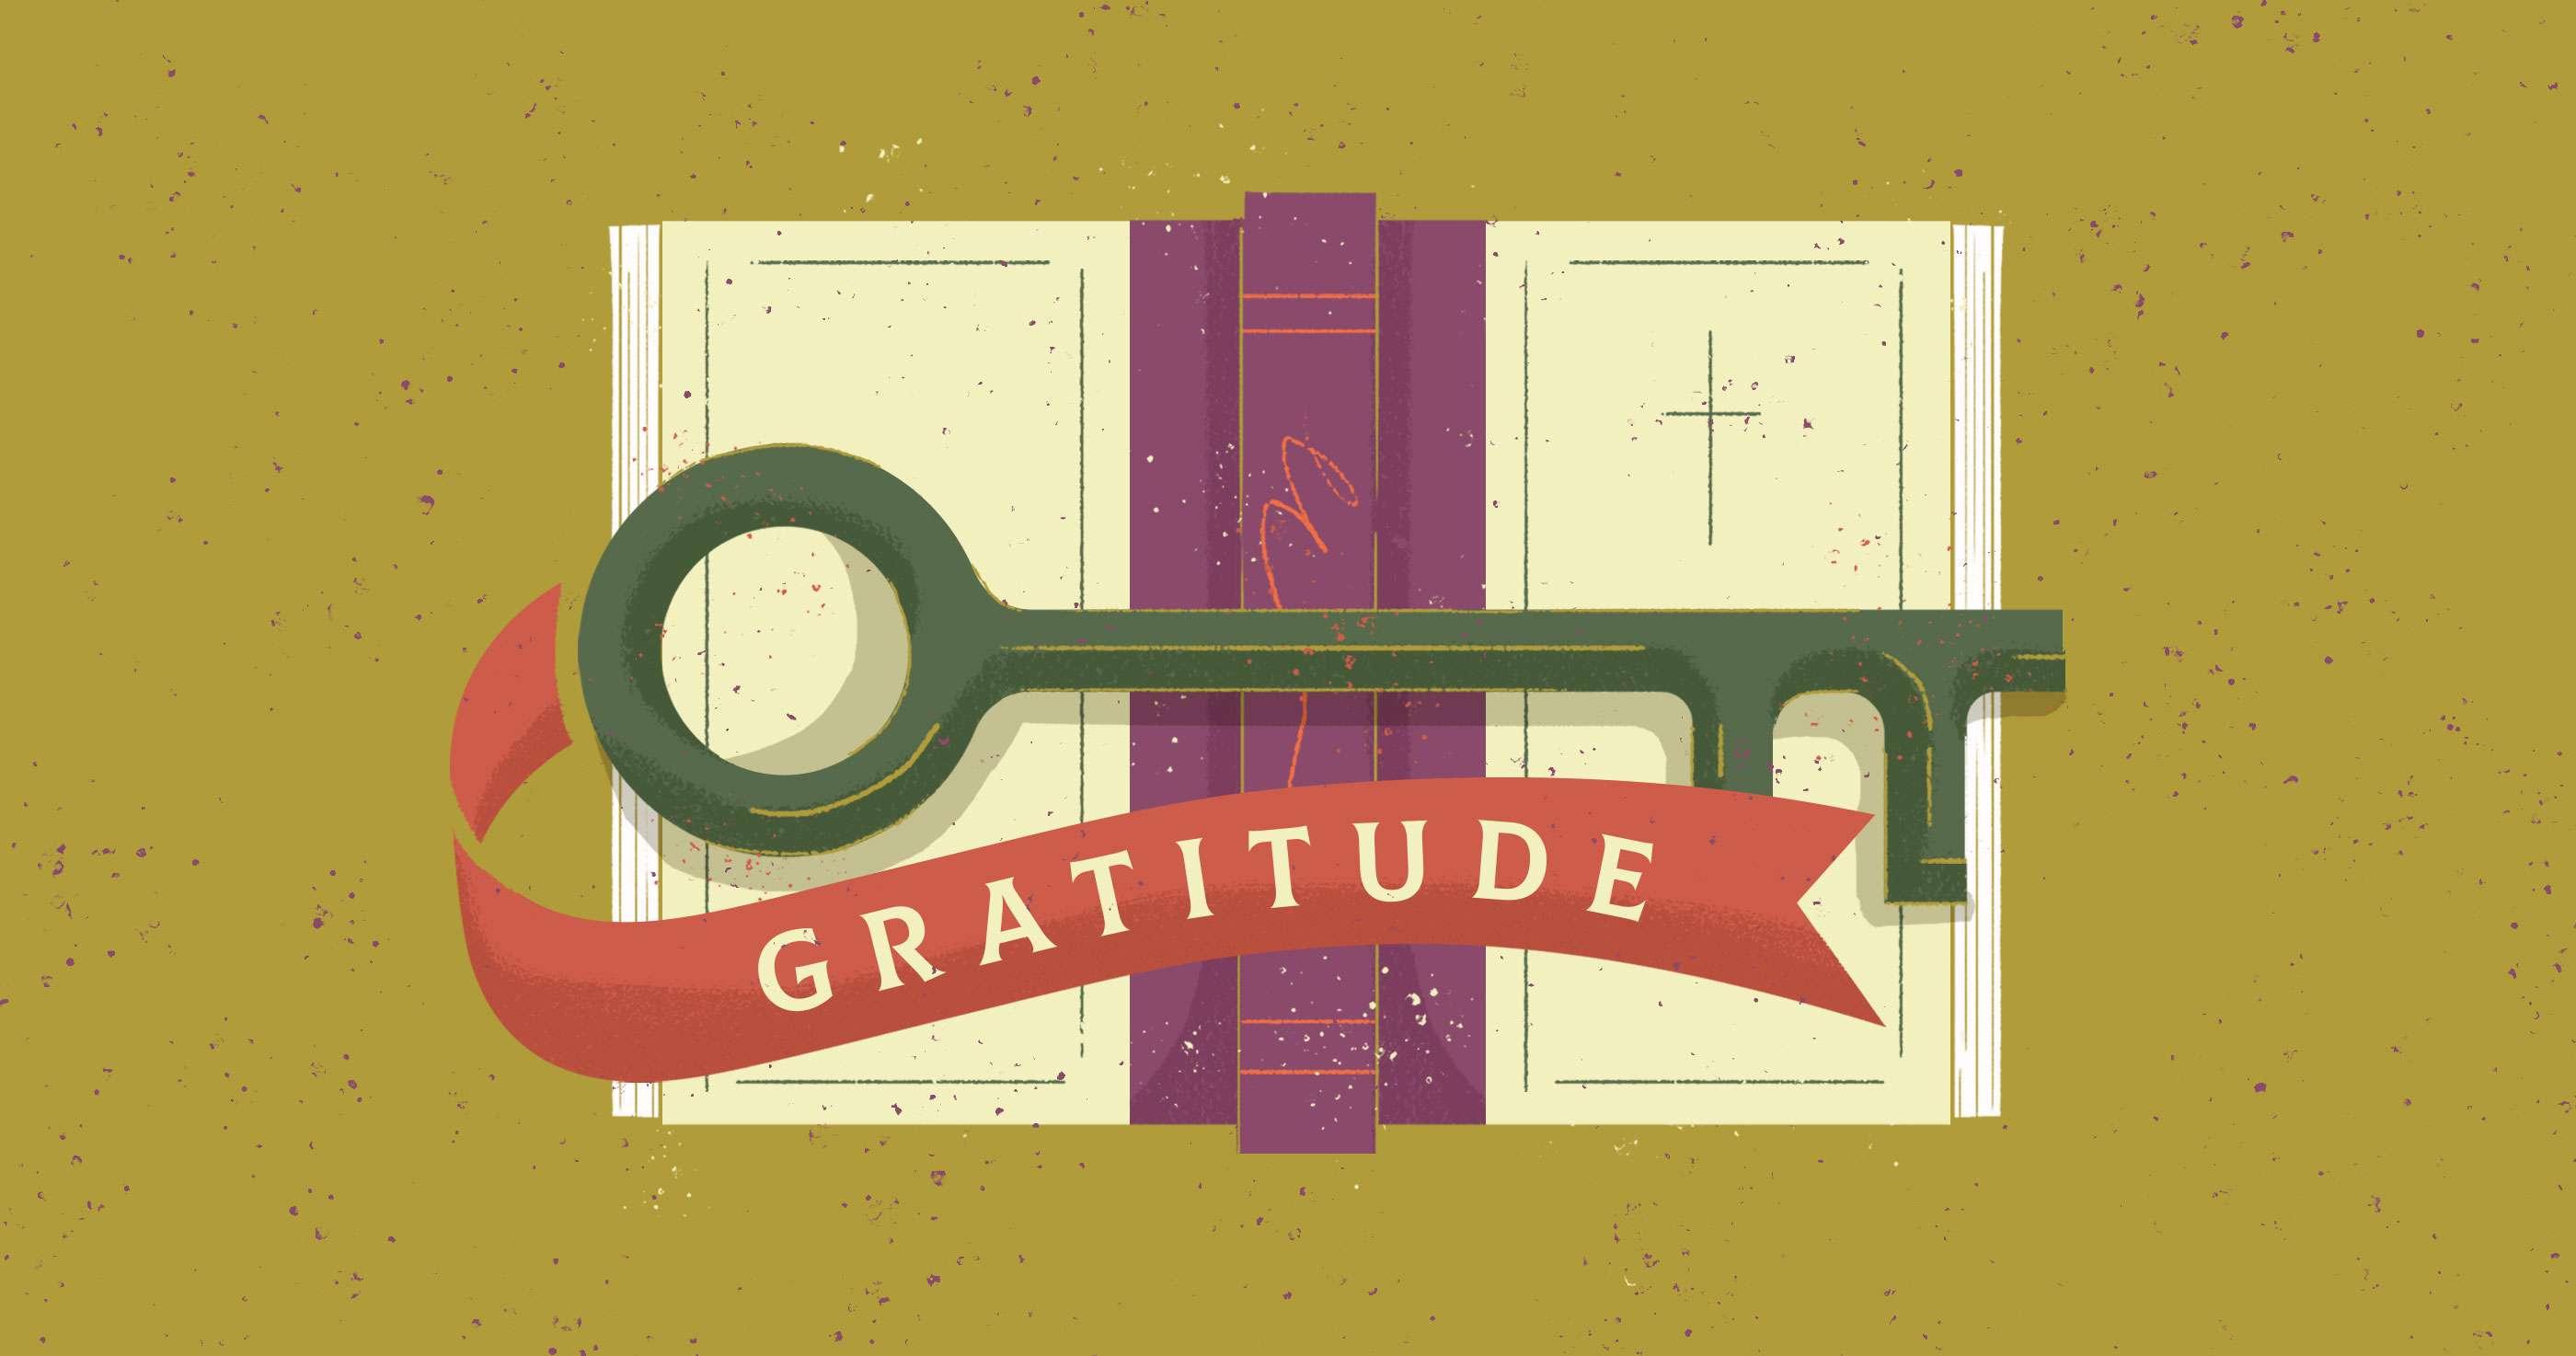 10 Key Bible Verses on Gratitude